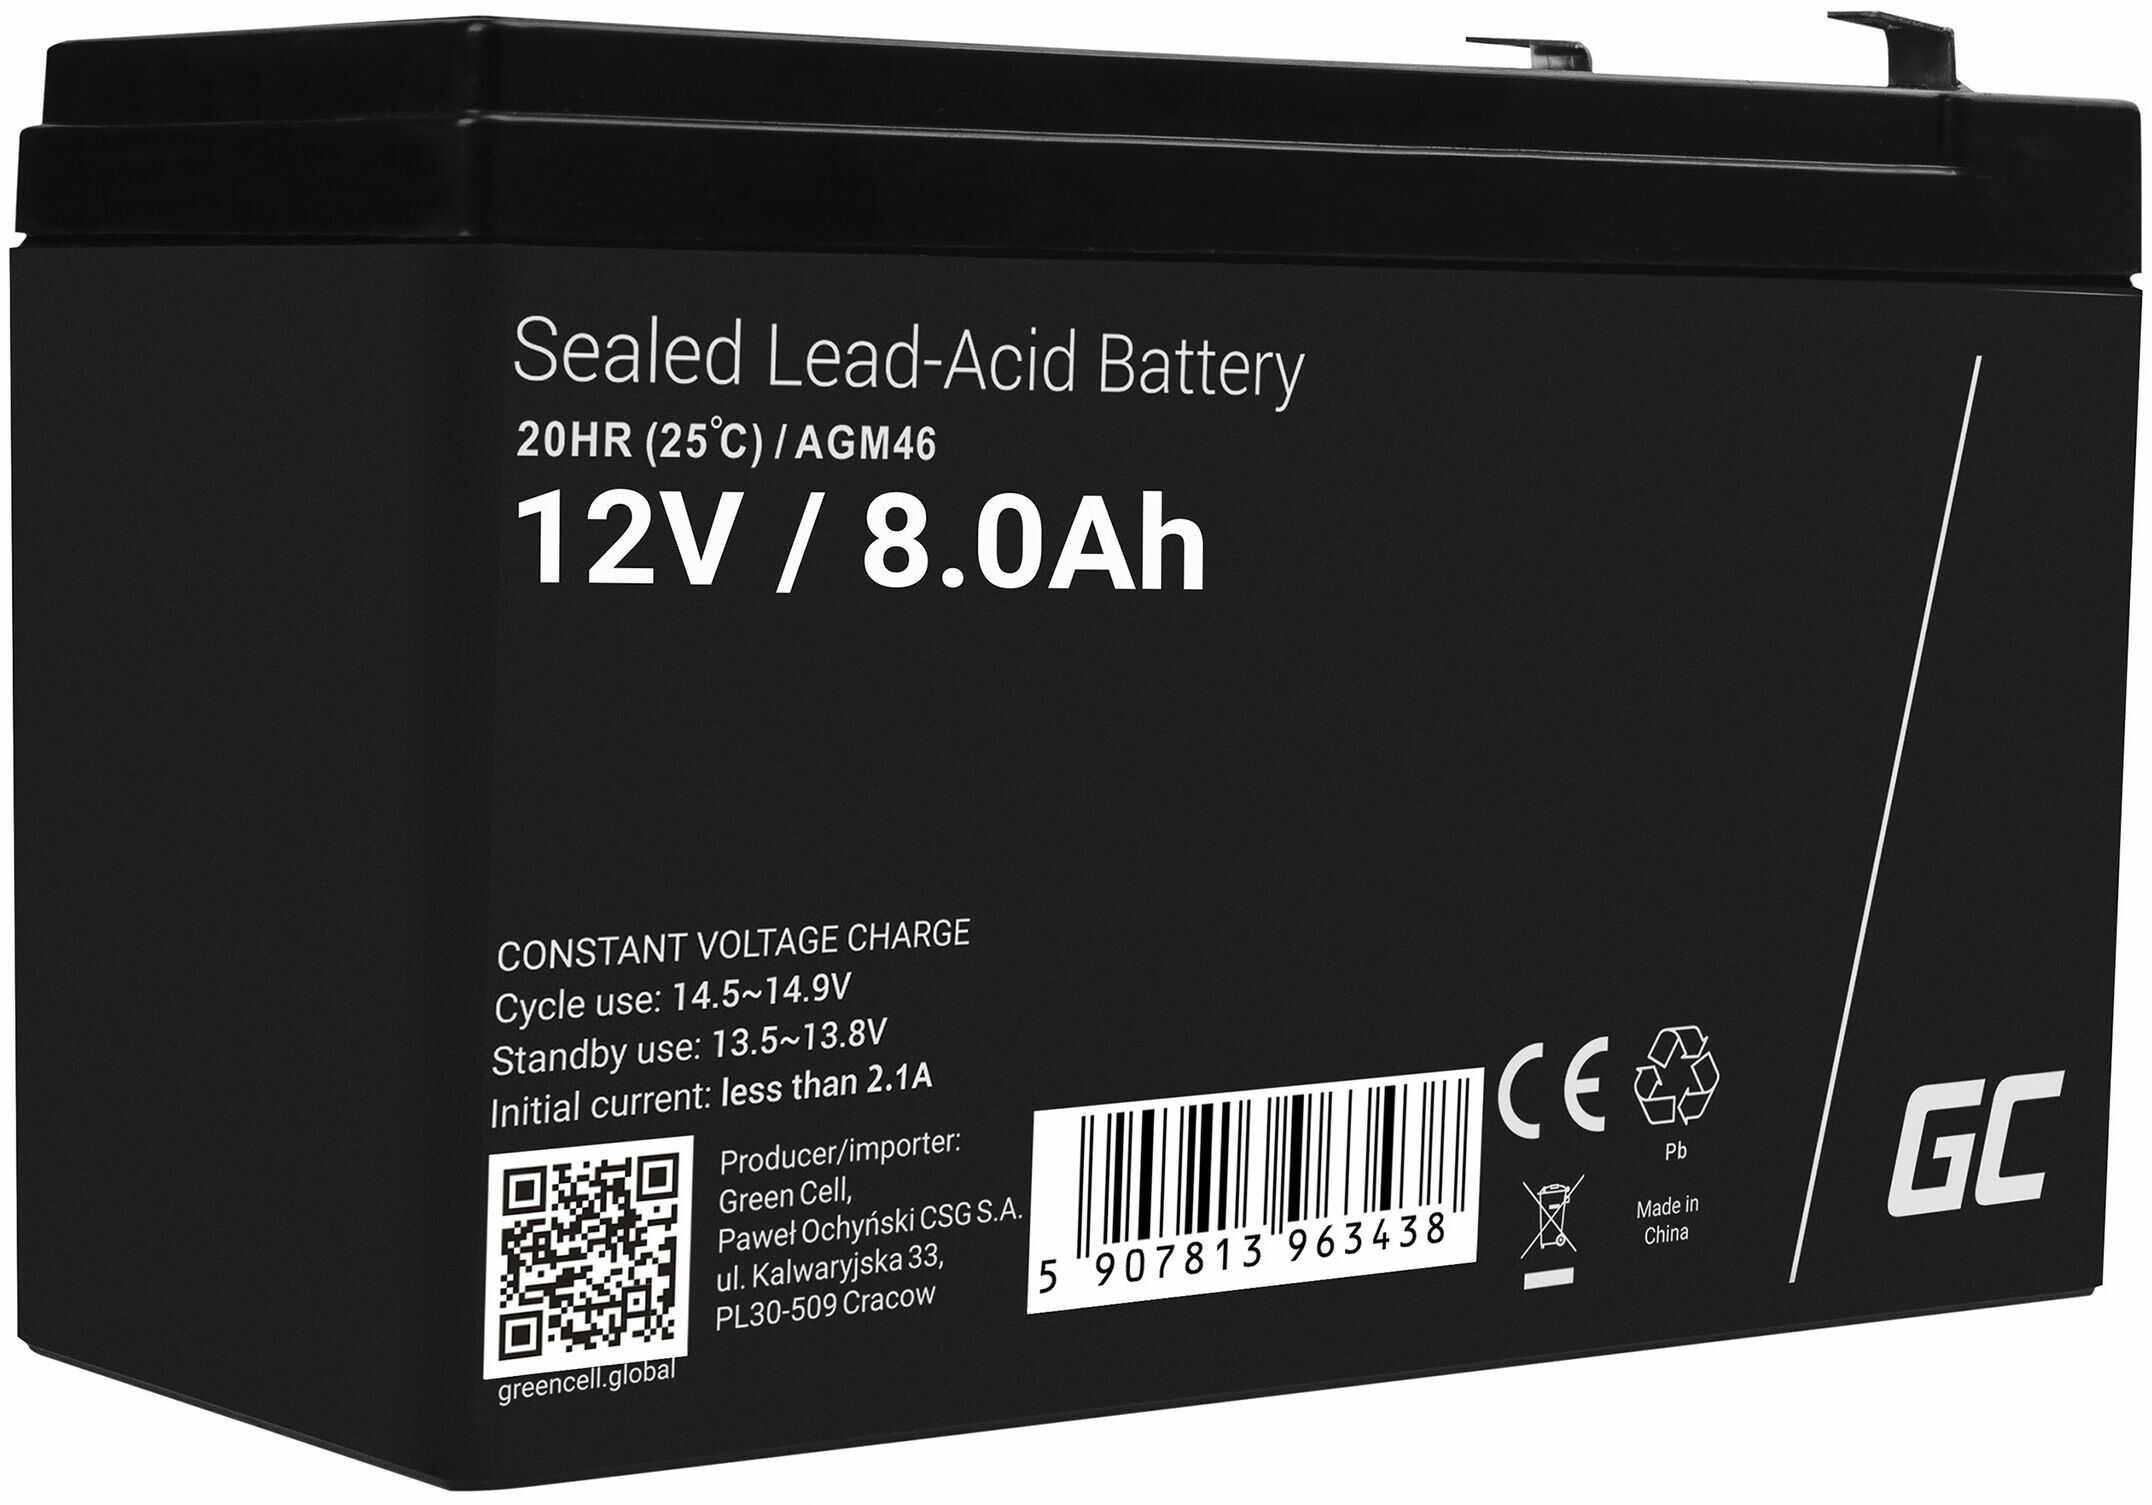 Green Cell AGM VRLA 12V 8Ah bezobsługowy akumulator do systemu alarmowego kasy fiskalnej zabawki